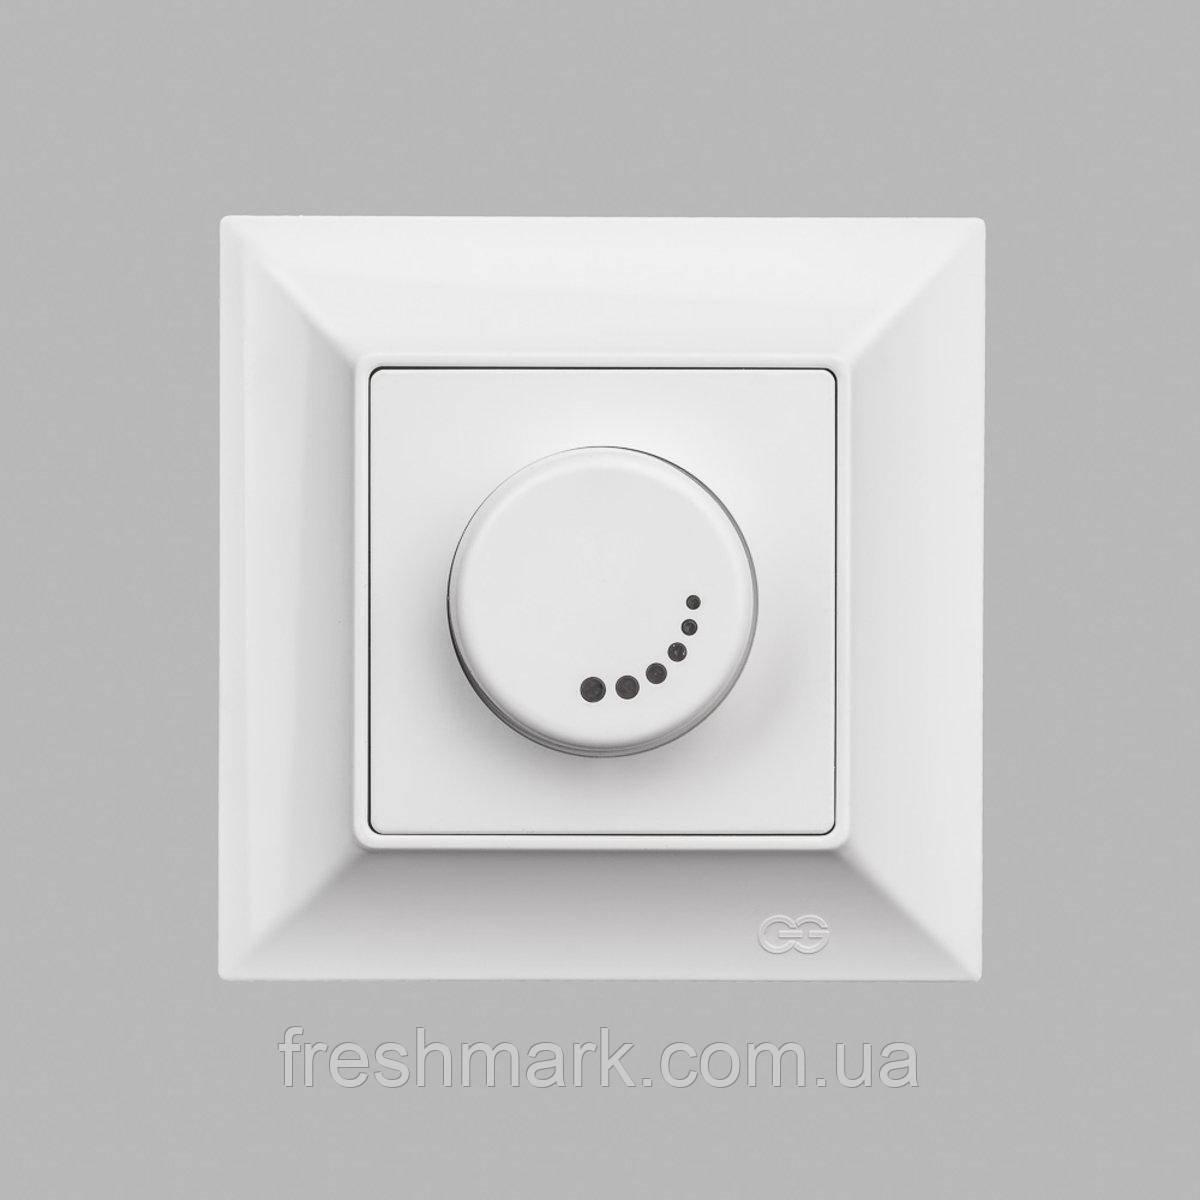 Светорегулятор GUNSAN Neoline 1000Вт Белый